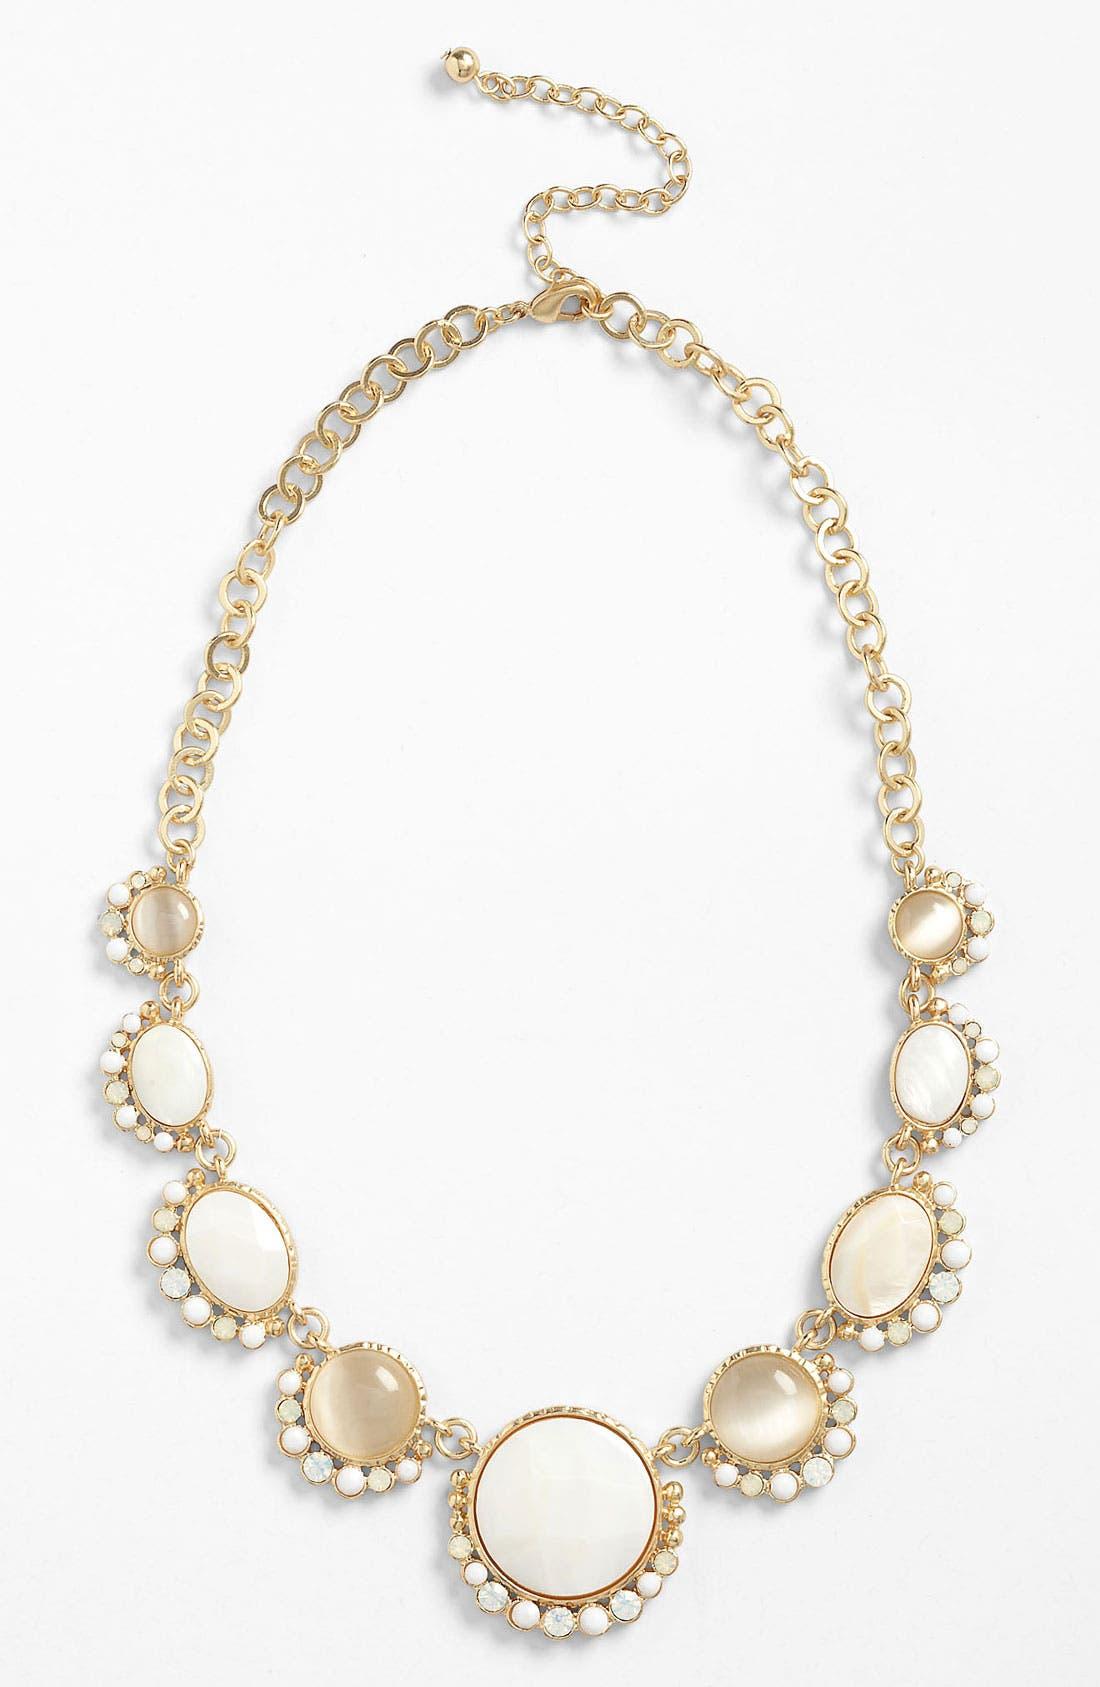 Main Image - Nordstrom 'Santorini' Collar Necklace